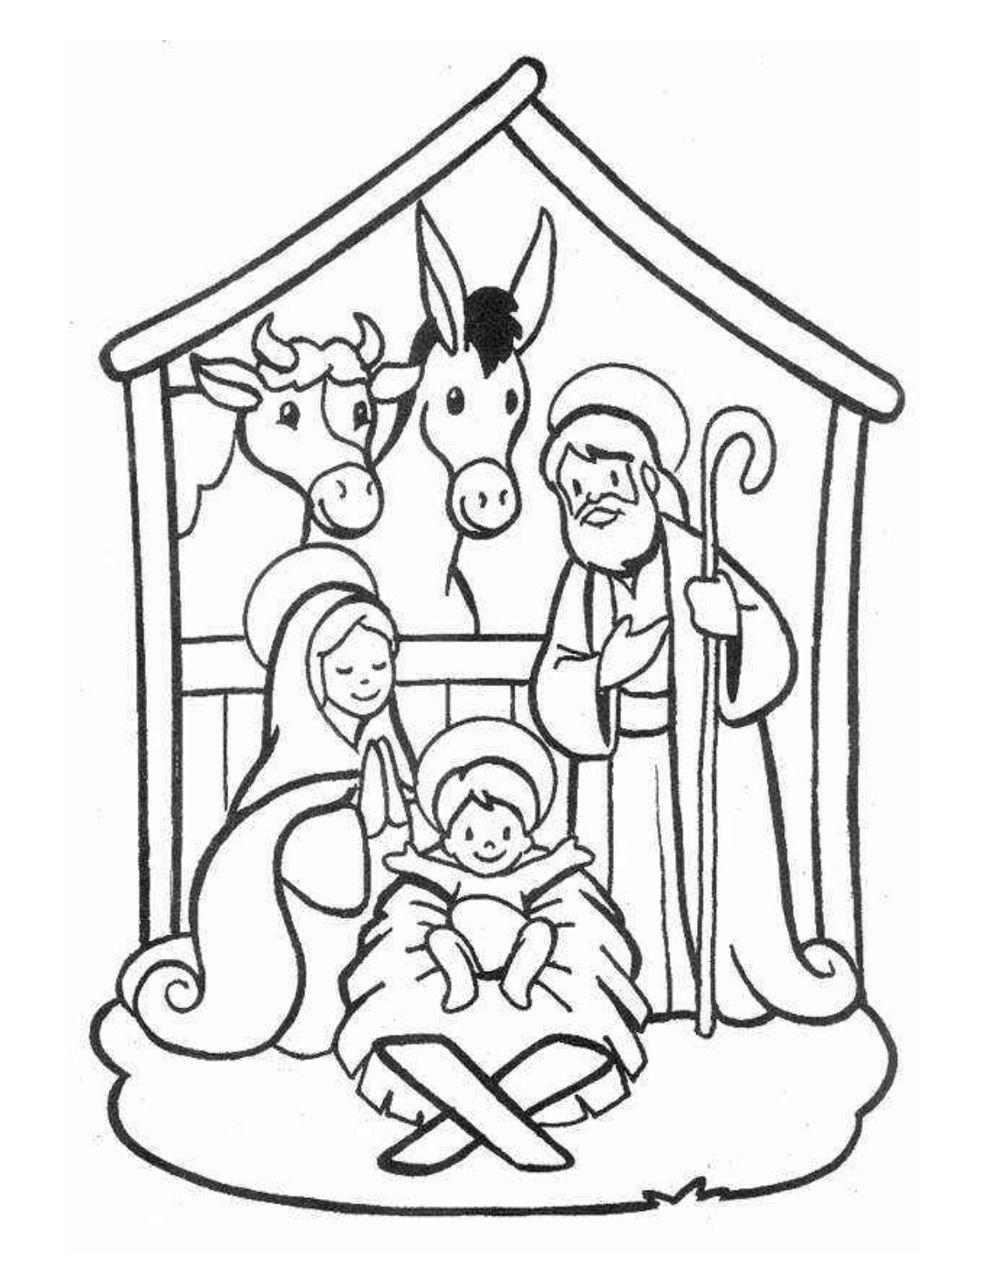 Dibujos navideños para colorear | Gabonak | Pinterest | Dibujos ...